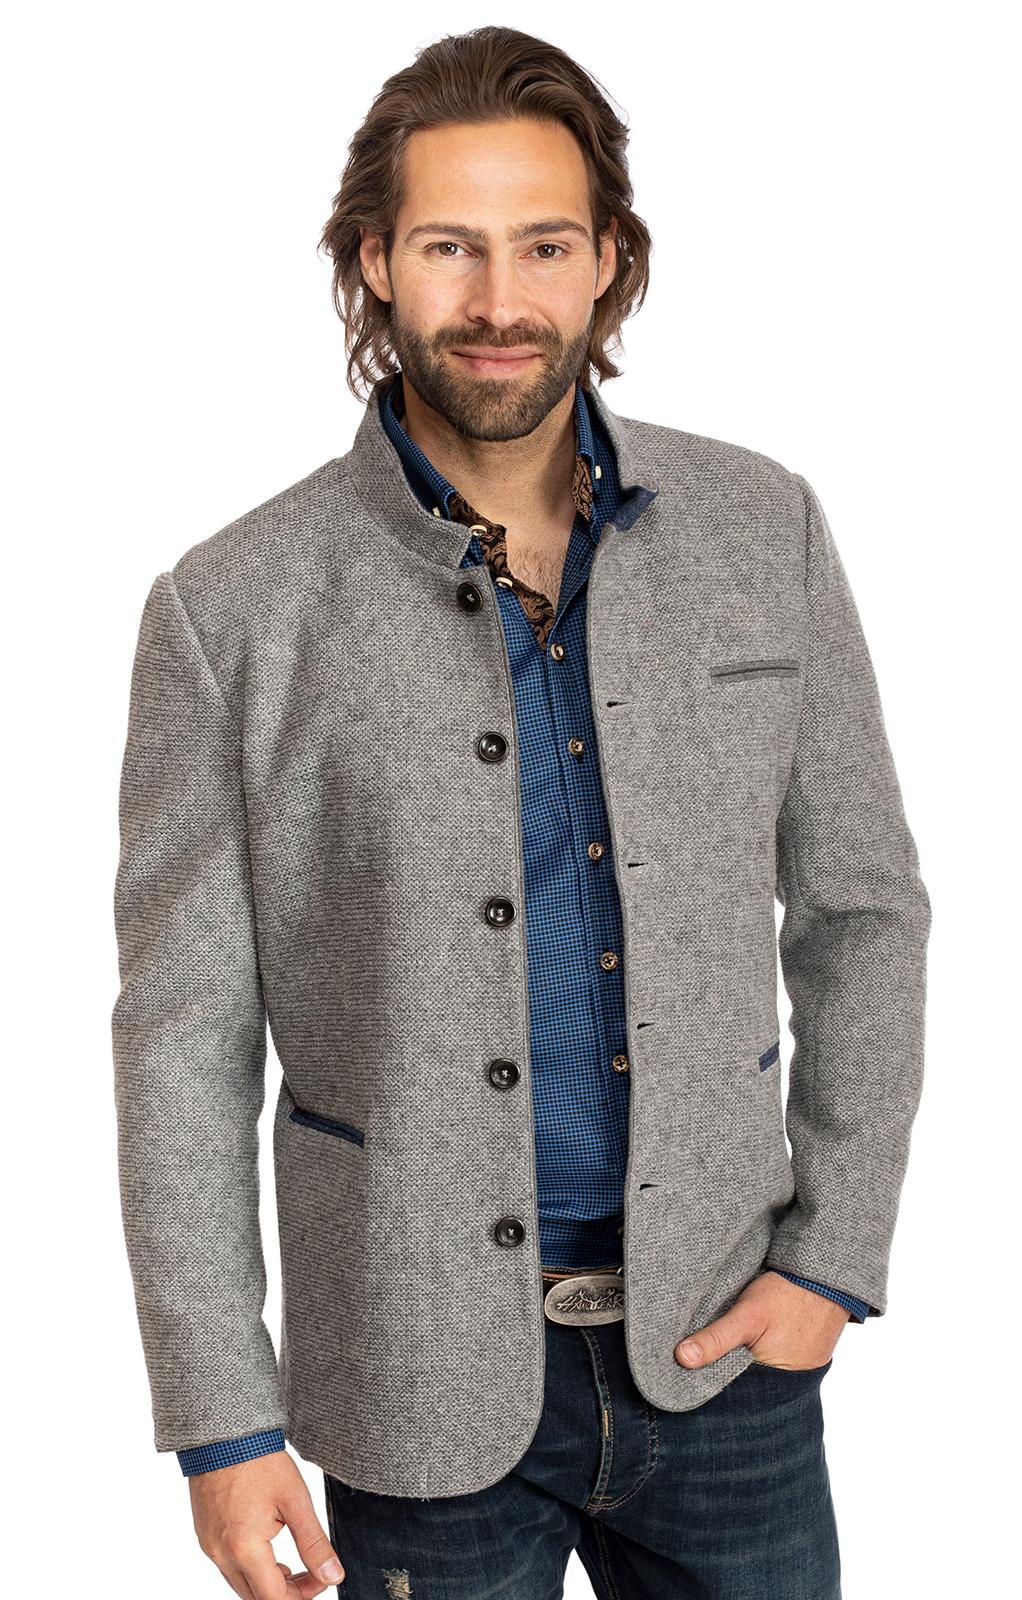 Jacke NARSBACH grau blau von Spieth & Wensky